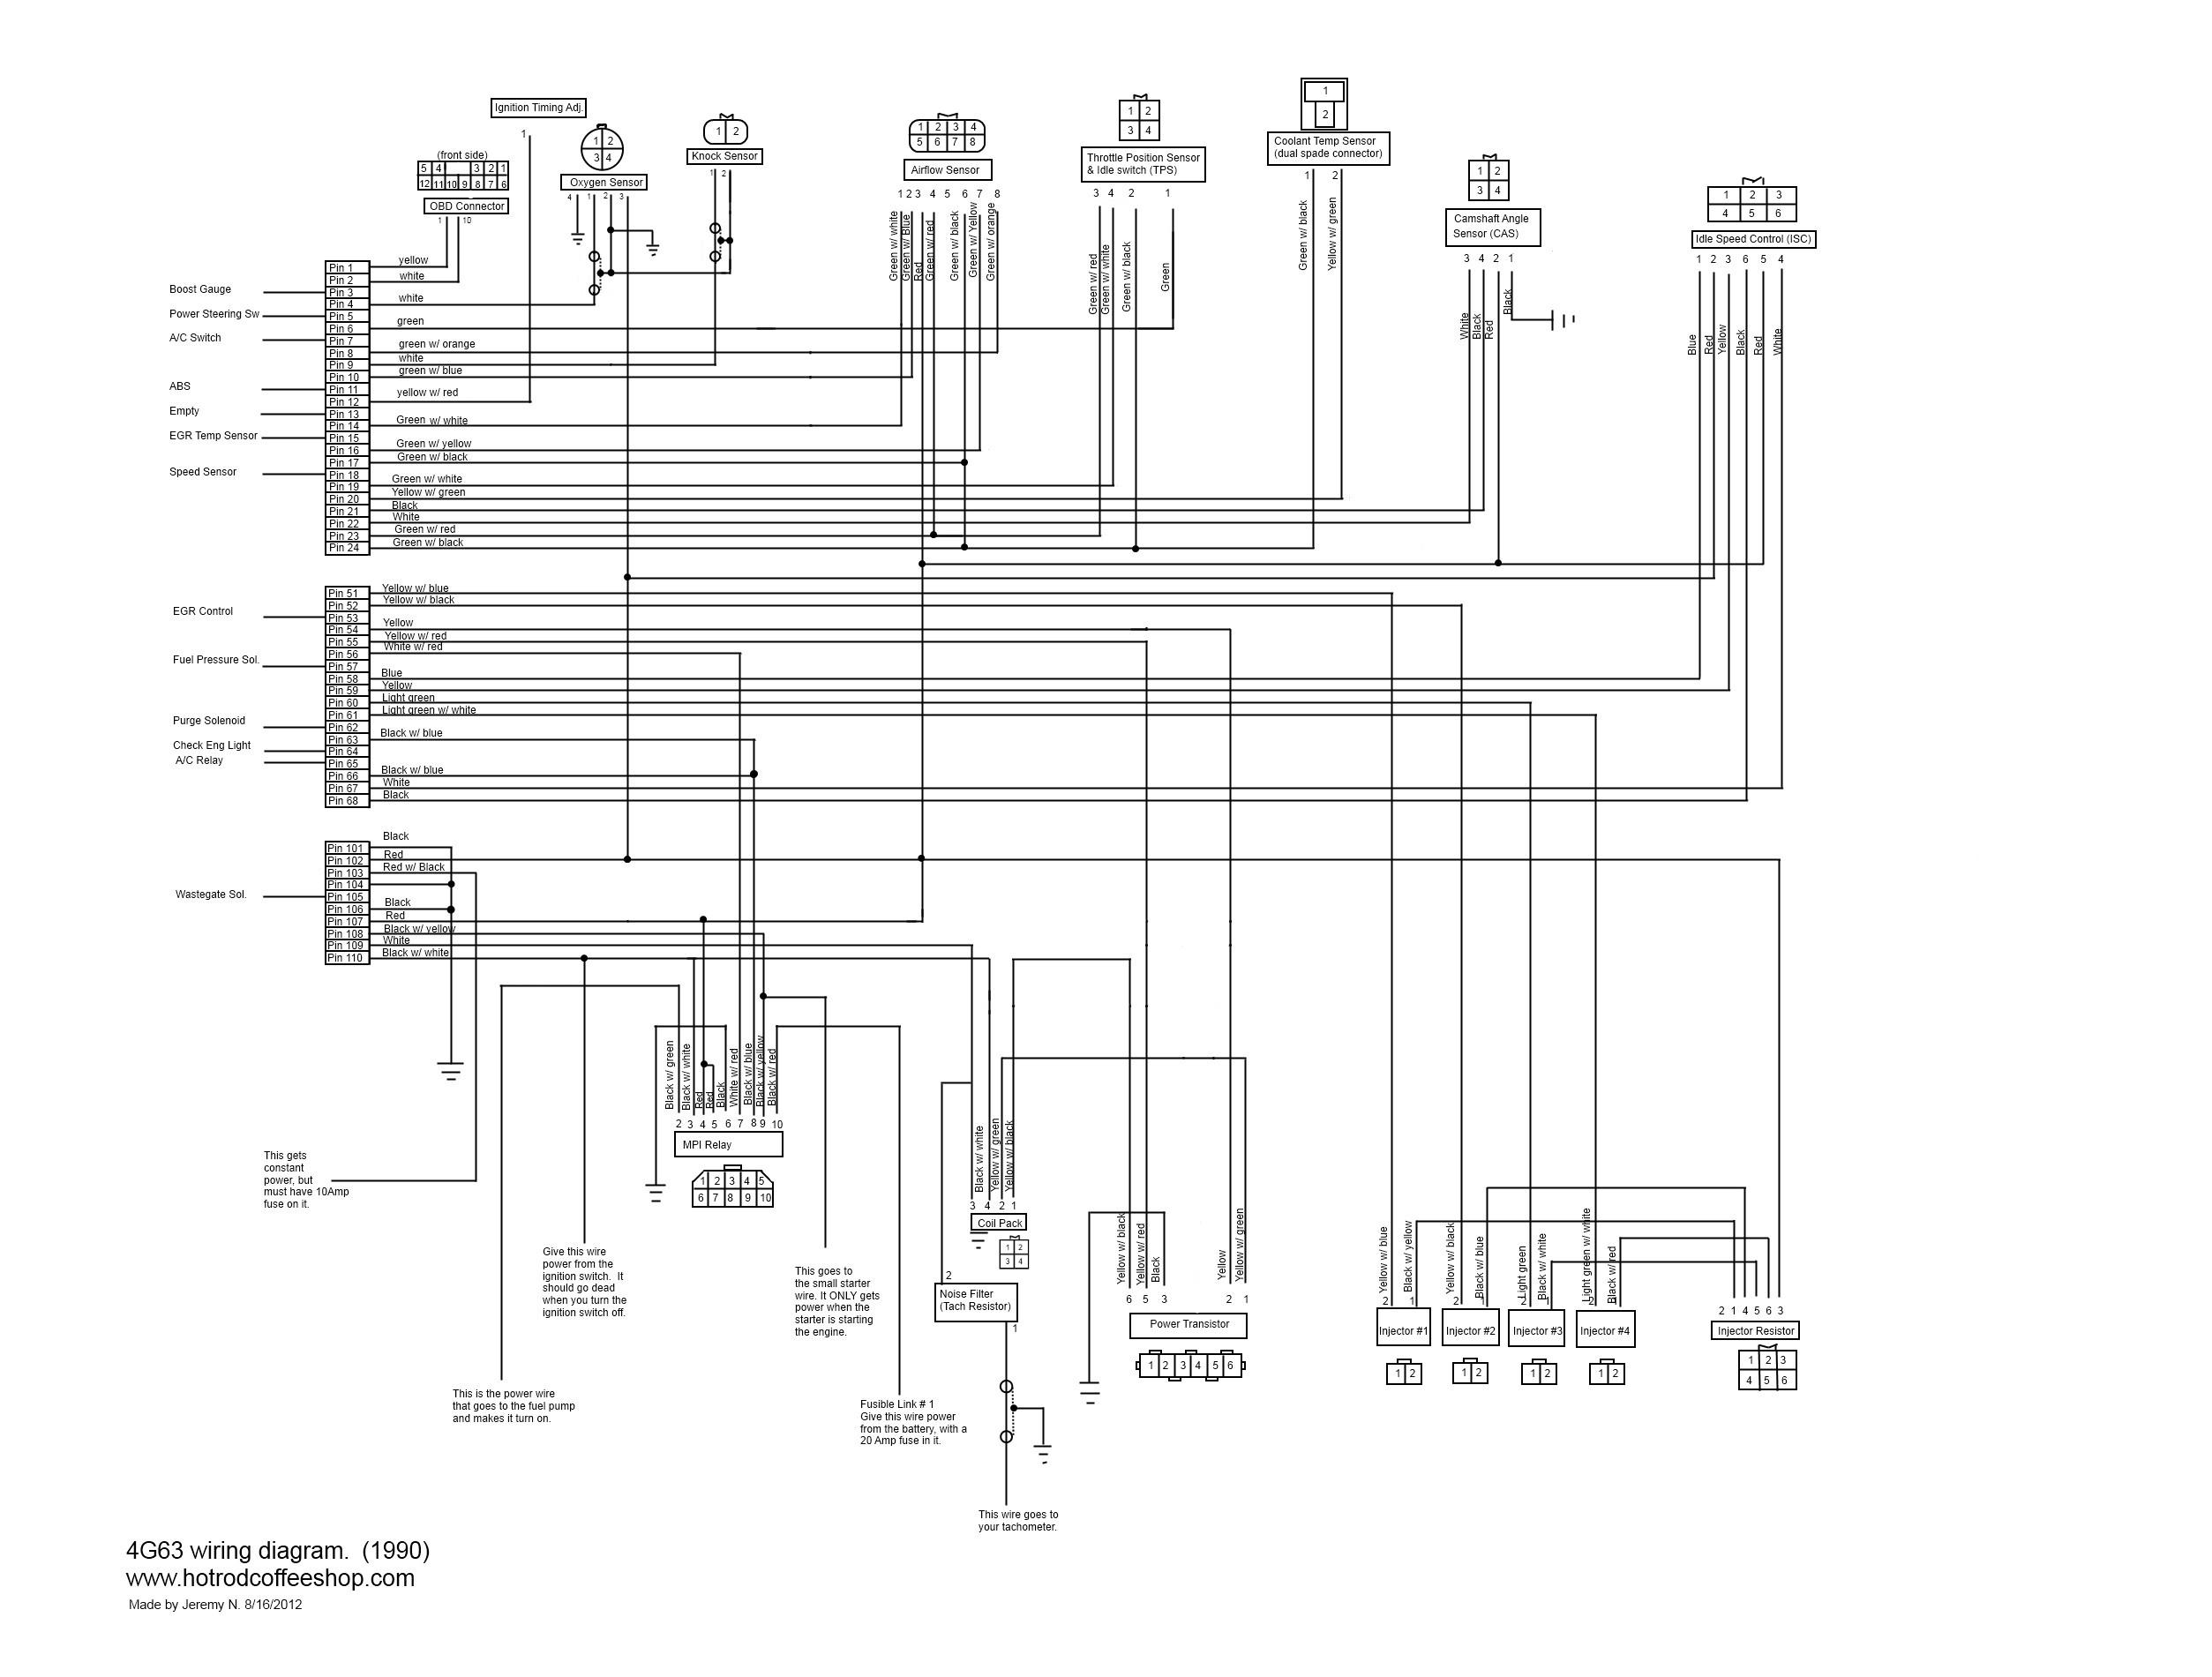 2000 Mitsubishi Eclipse Wiring Diagram Automatic Dsm S for 4g63 Wiring Diagram Autoctono Of 2000 Mitsubishi Eclipse Wiring Diagram